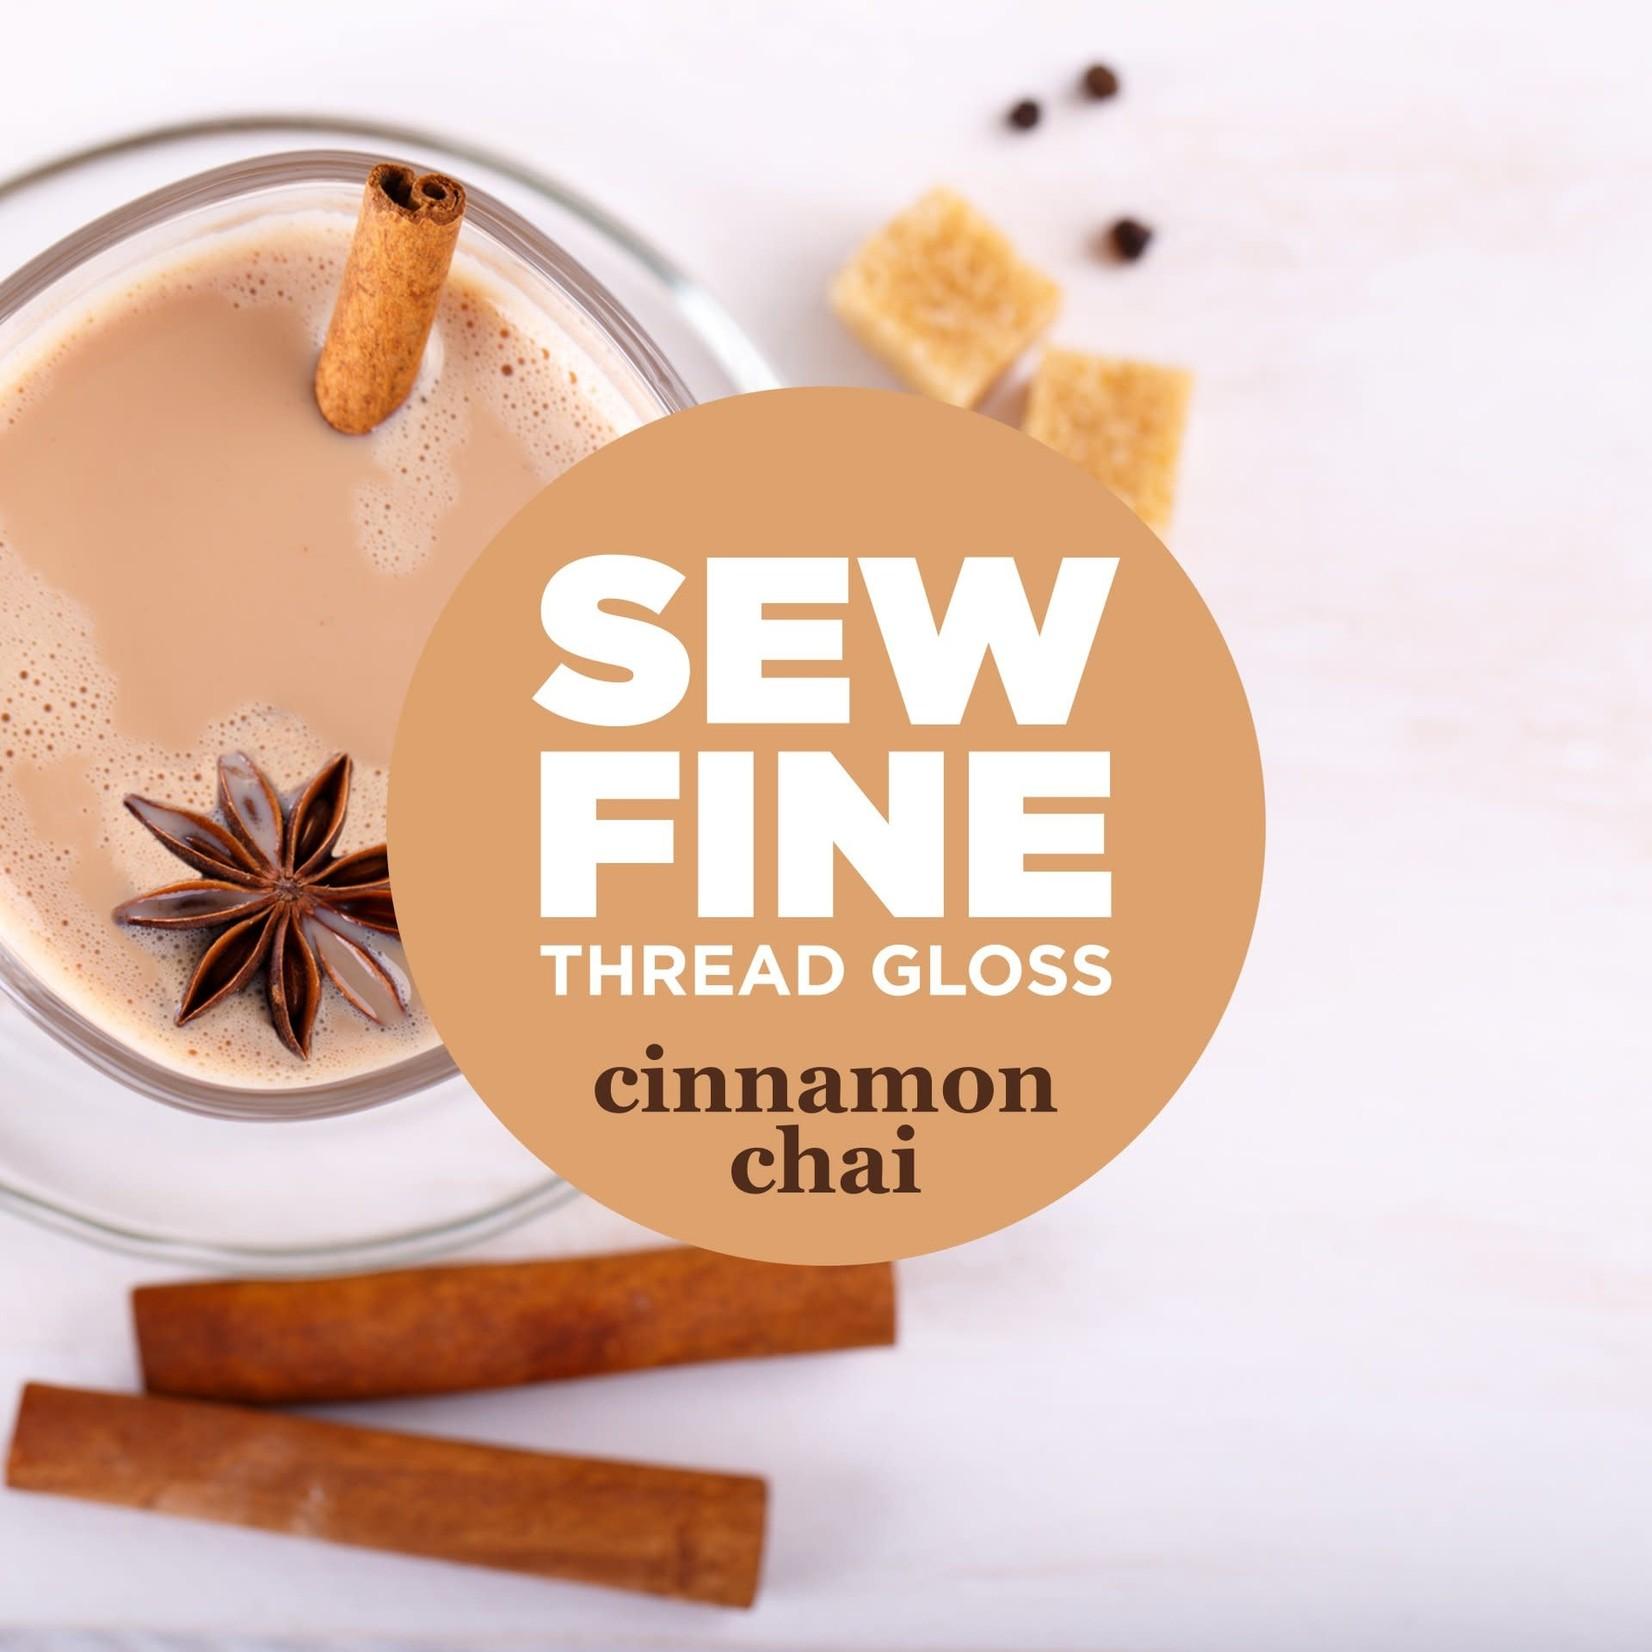 Sew Fine Sew Fine Thread Gloss: Cinnamon Chai 0.5 oz